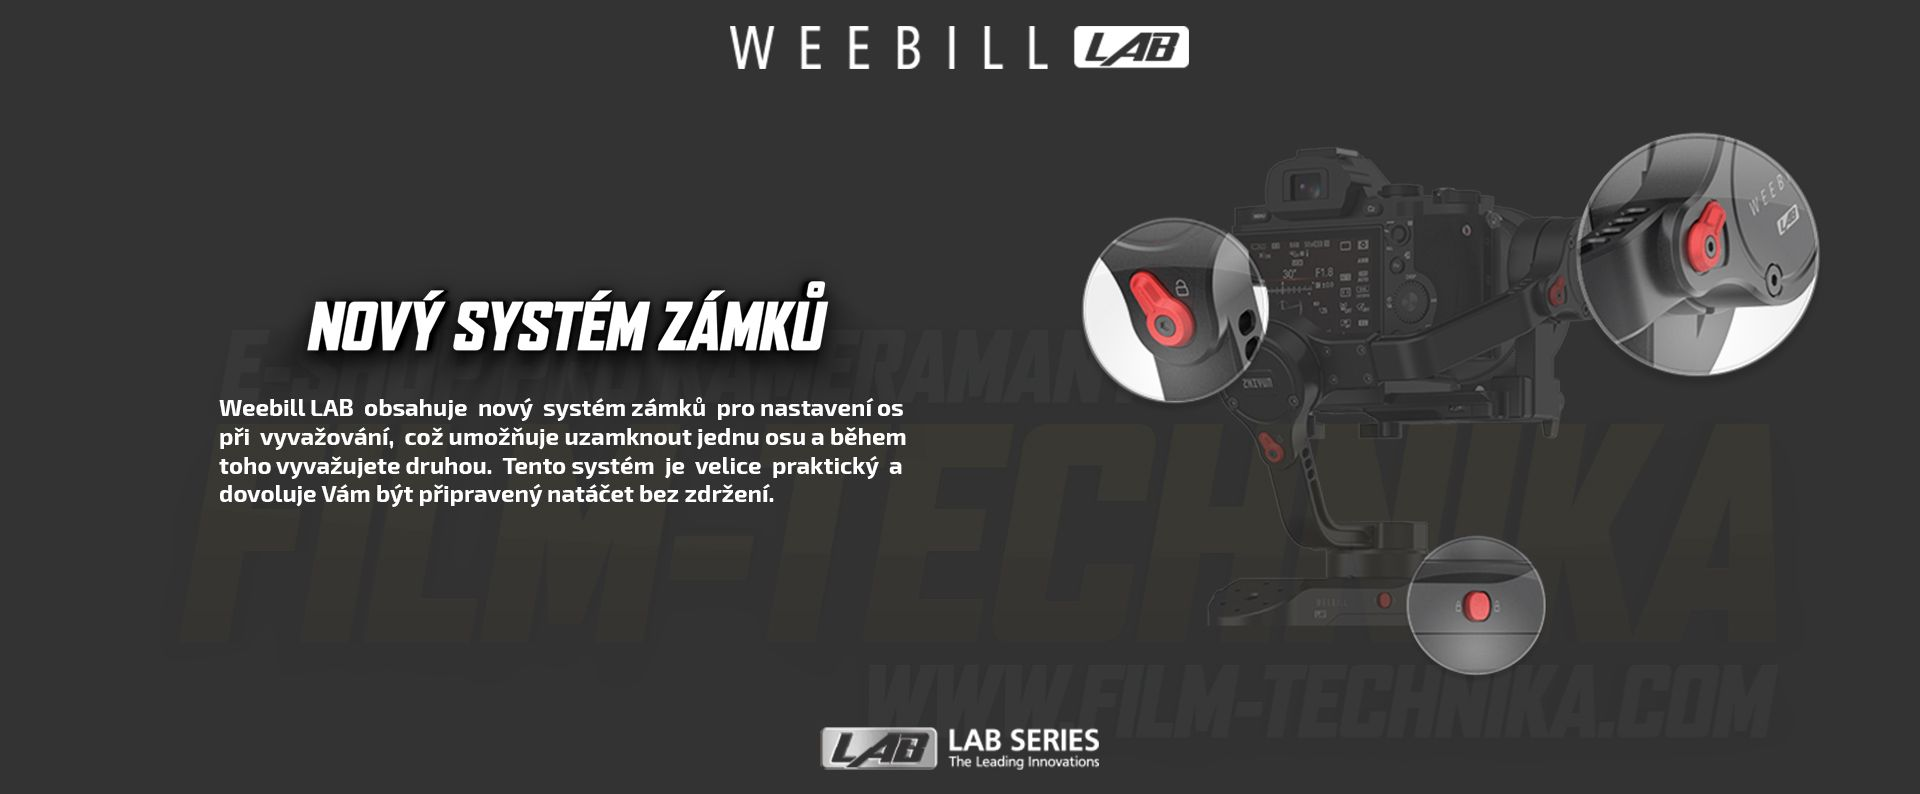 film-technika-zhiyun-weebill-lab-intext7a